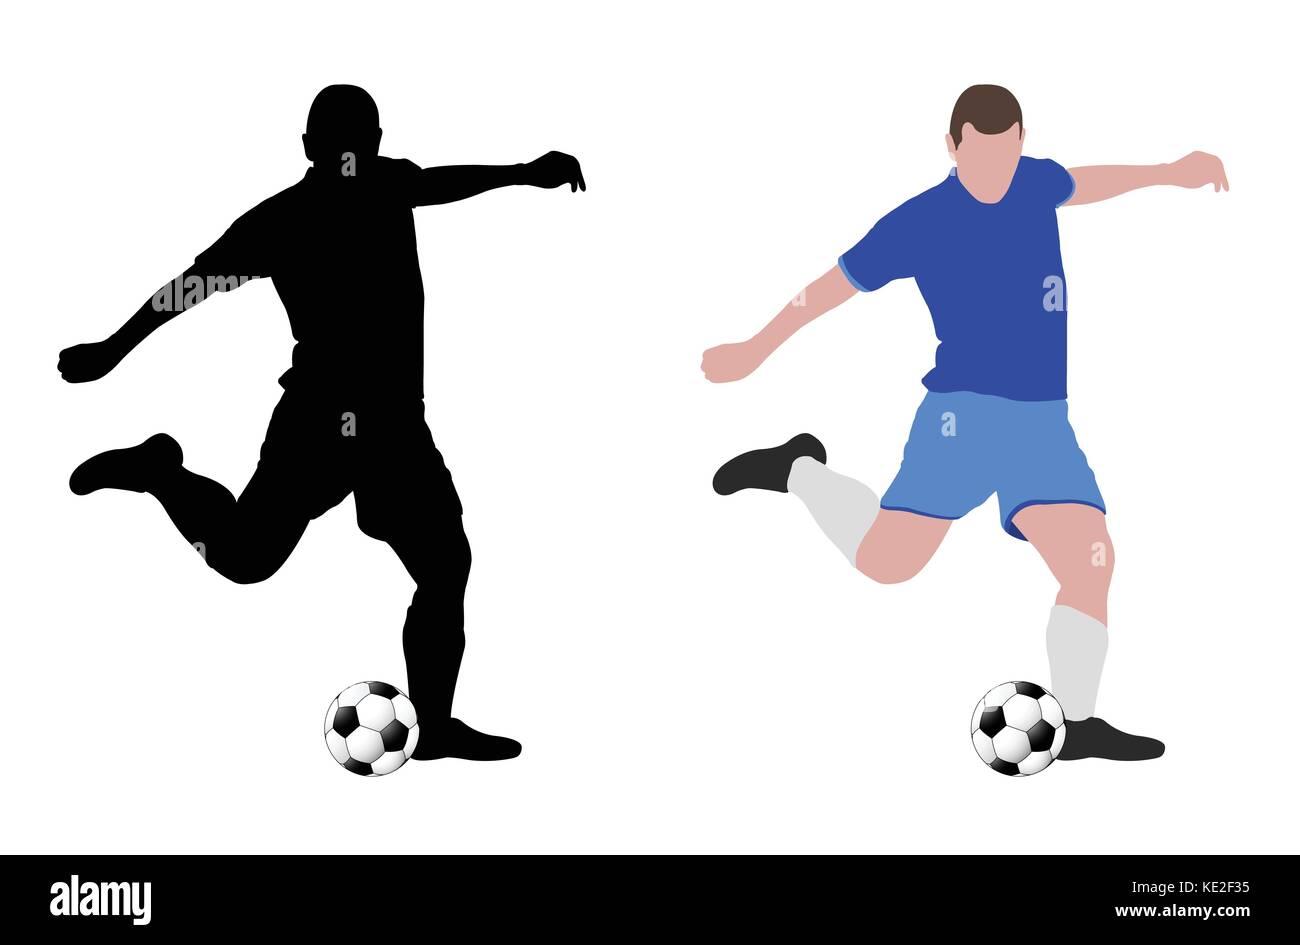 soccer player - vector illustration - Stock Image